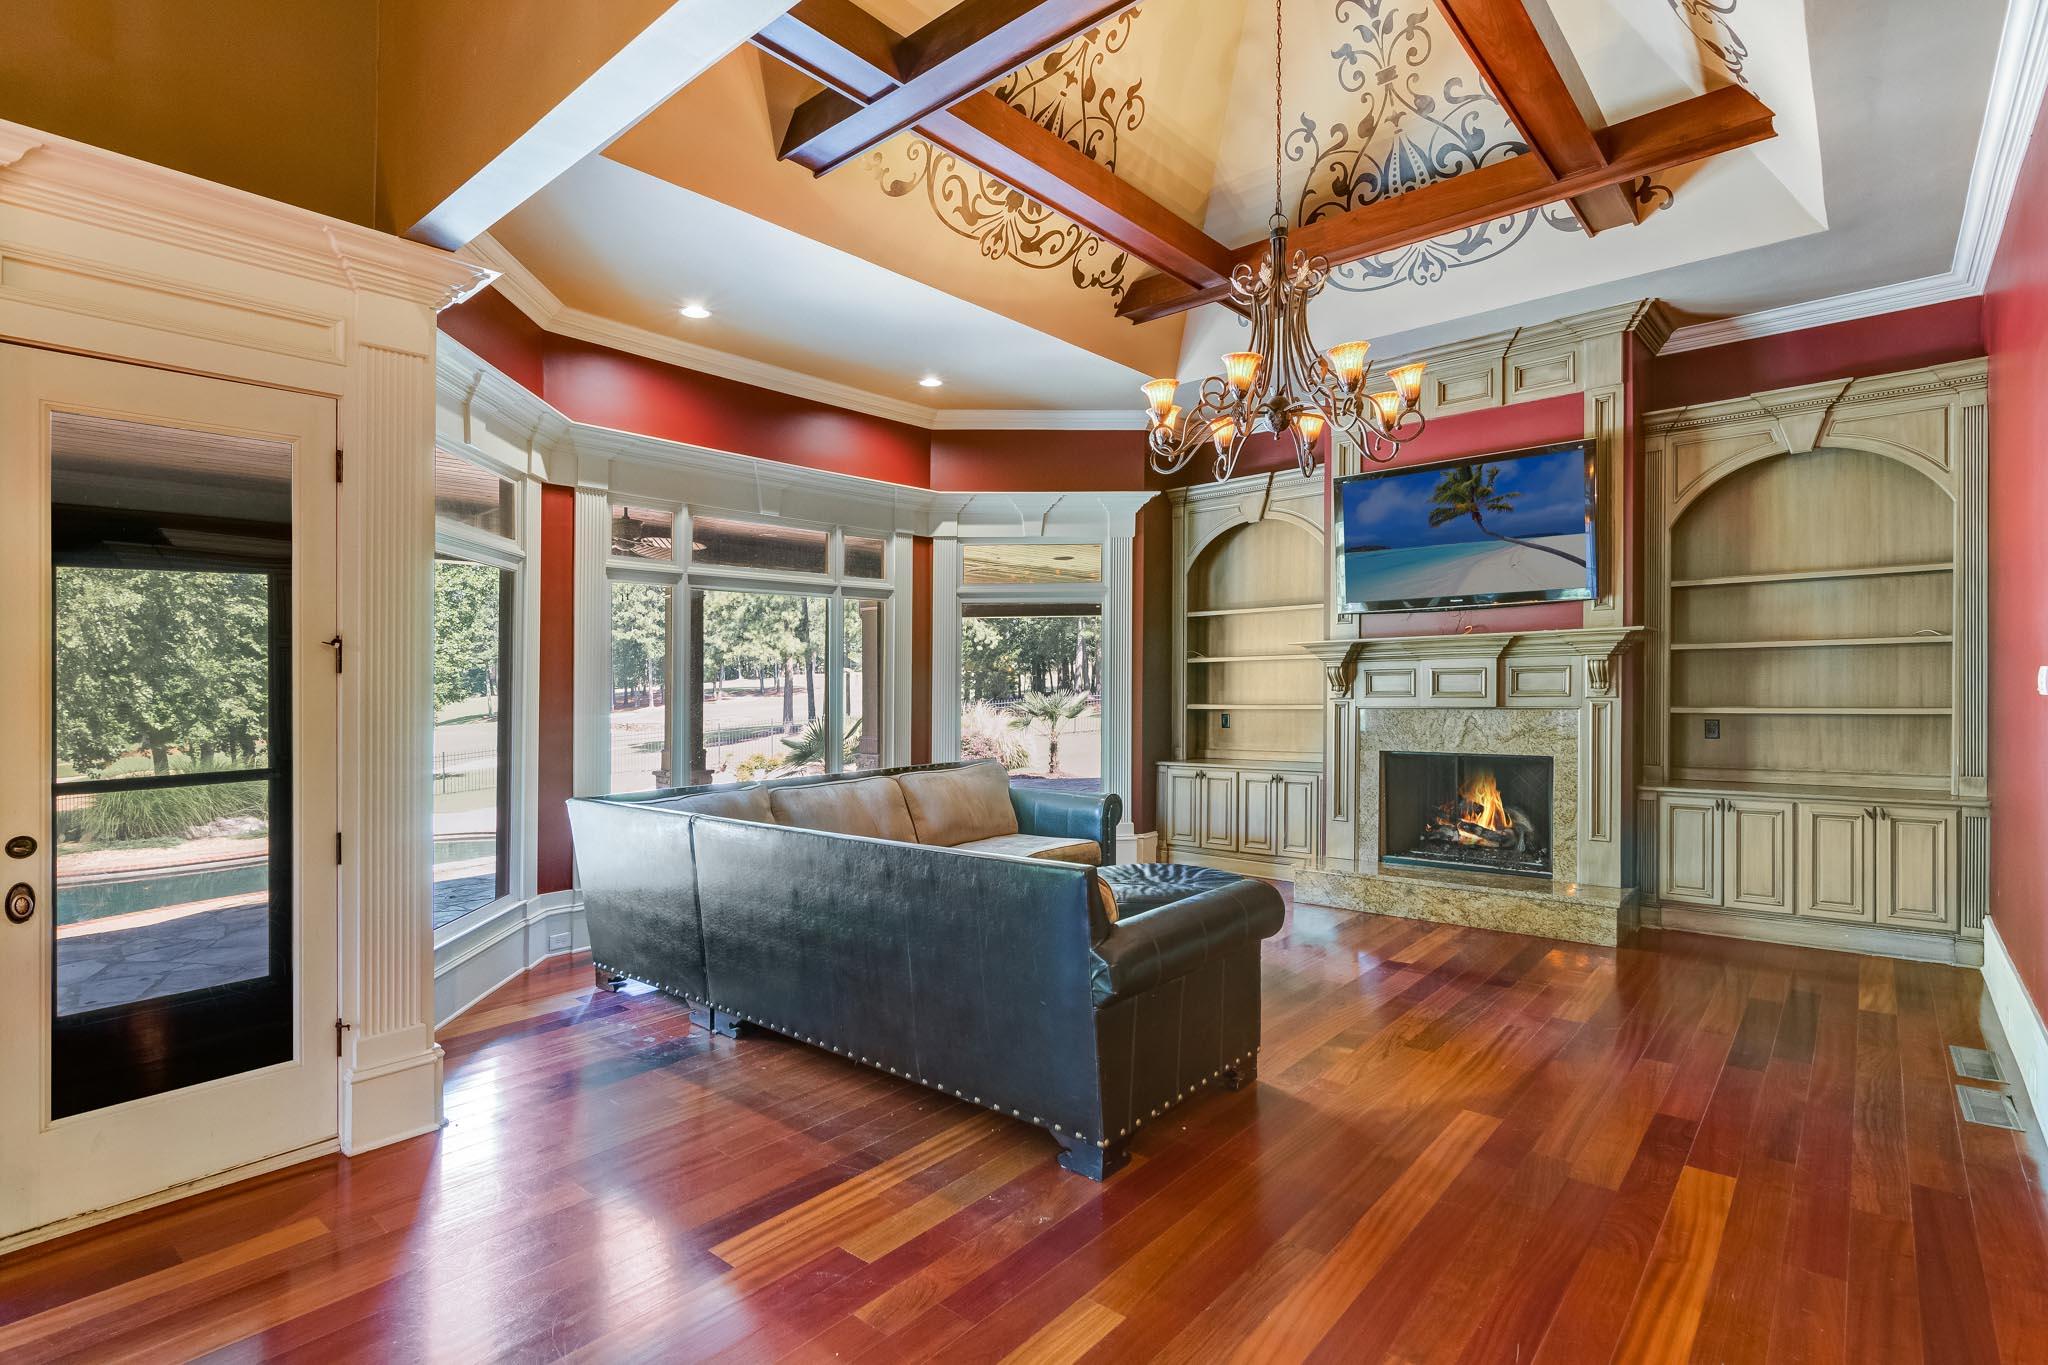 real_estate_photographer_living_room_photography-1.jpg